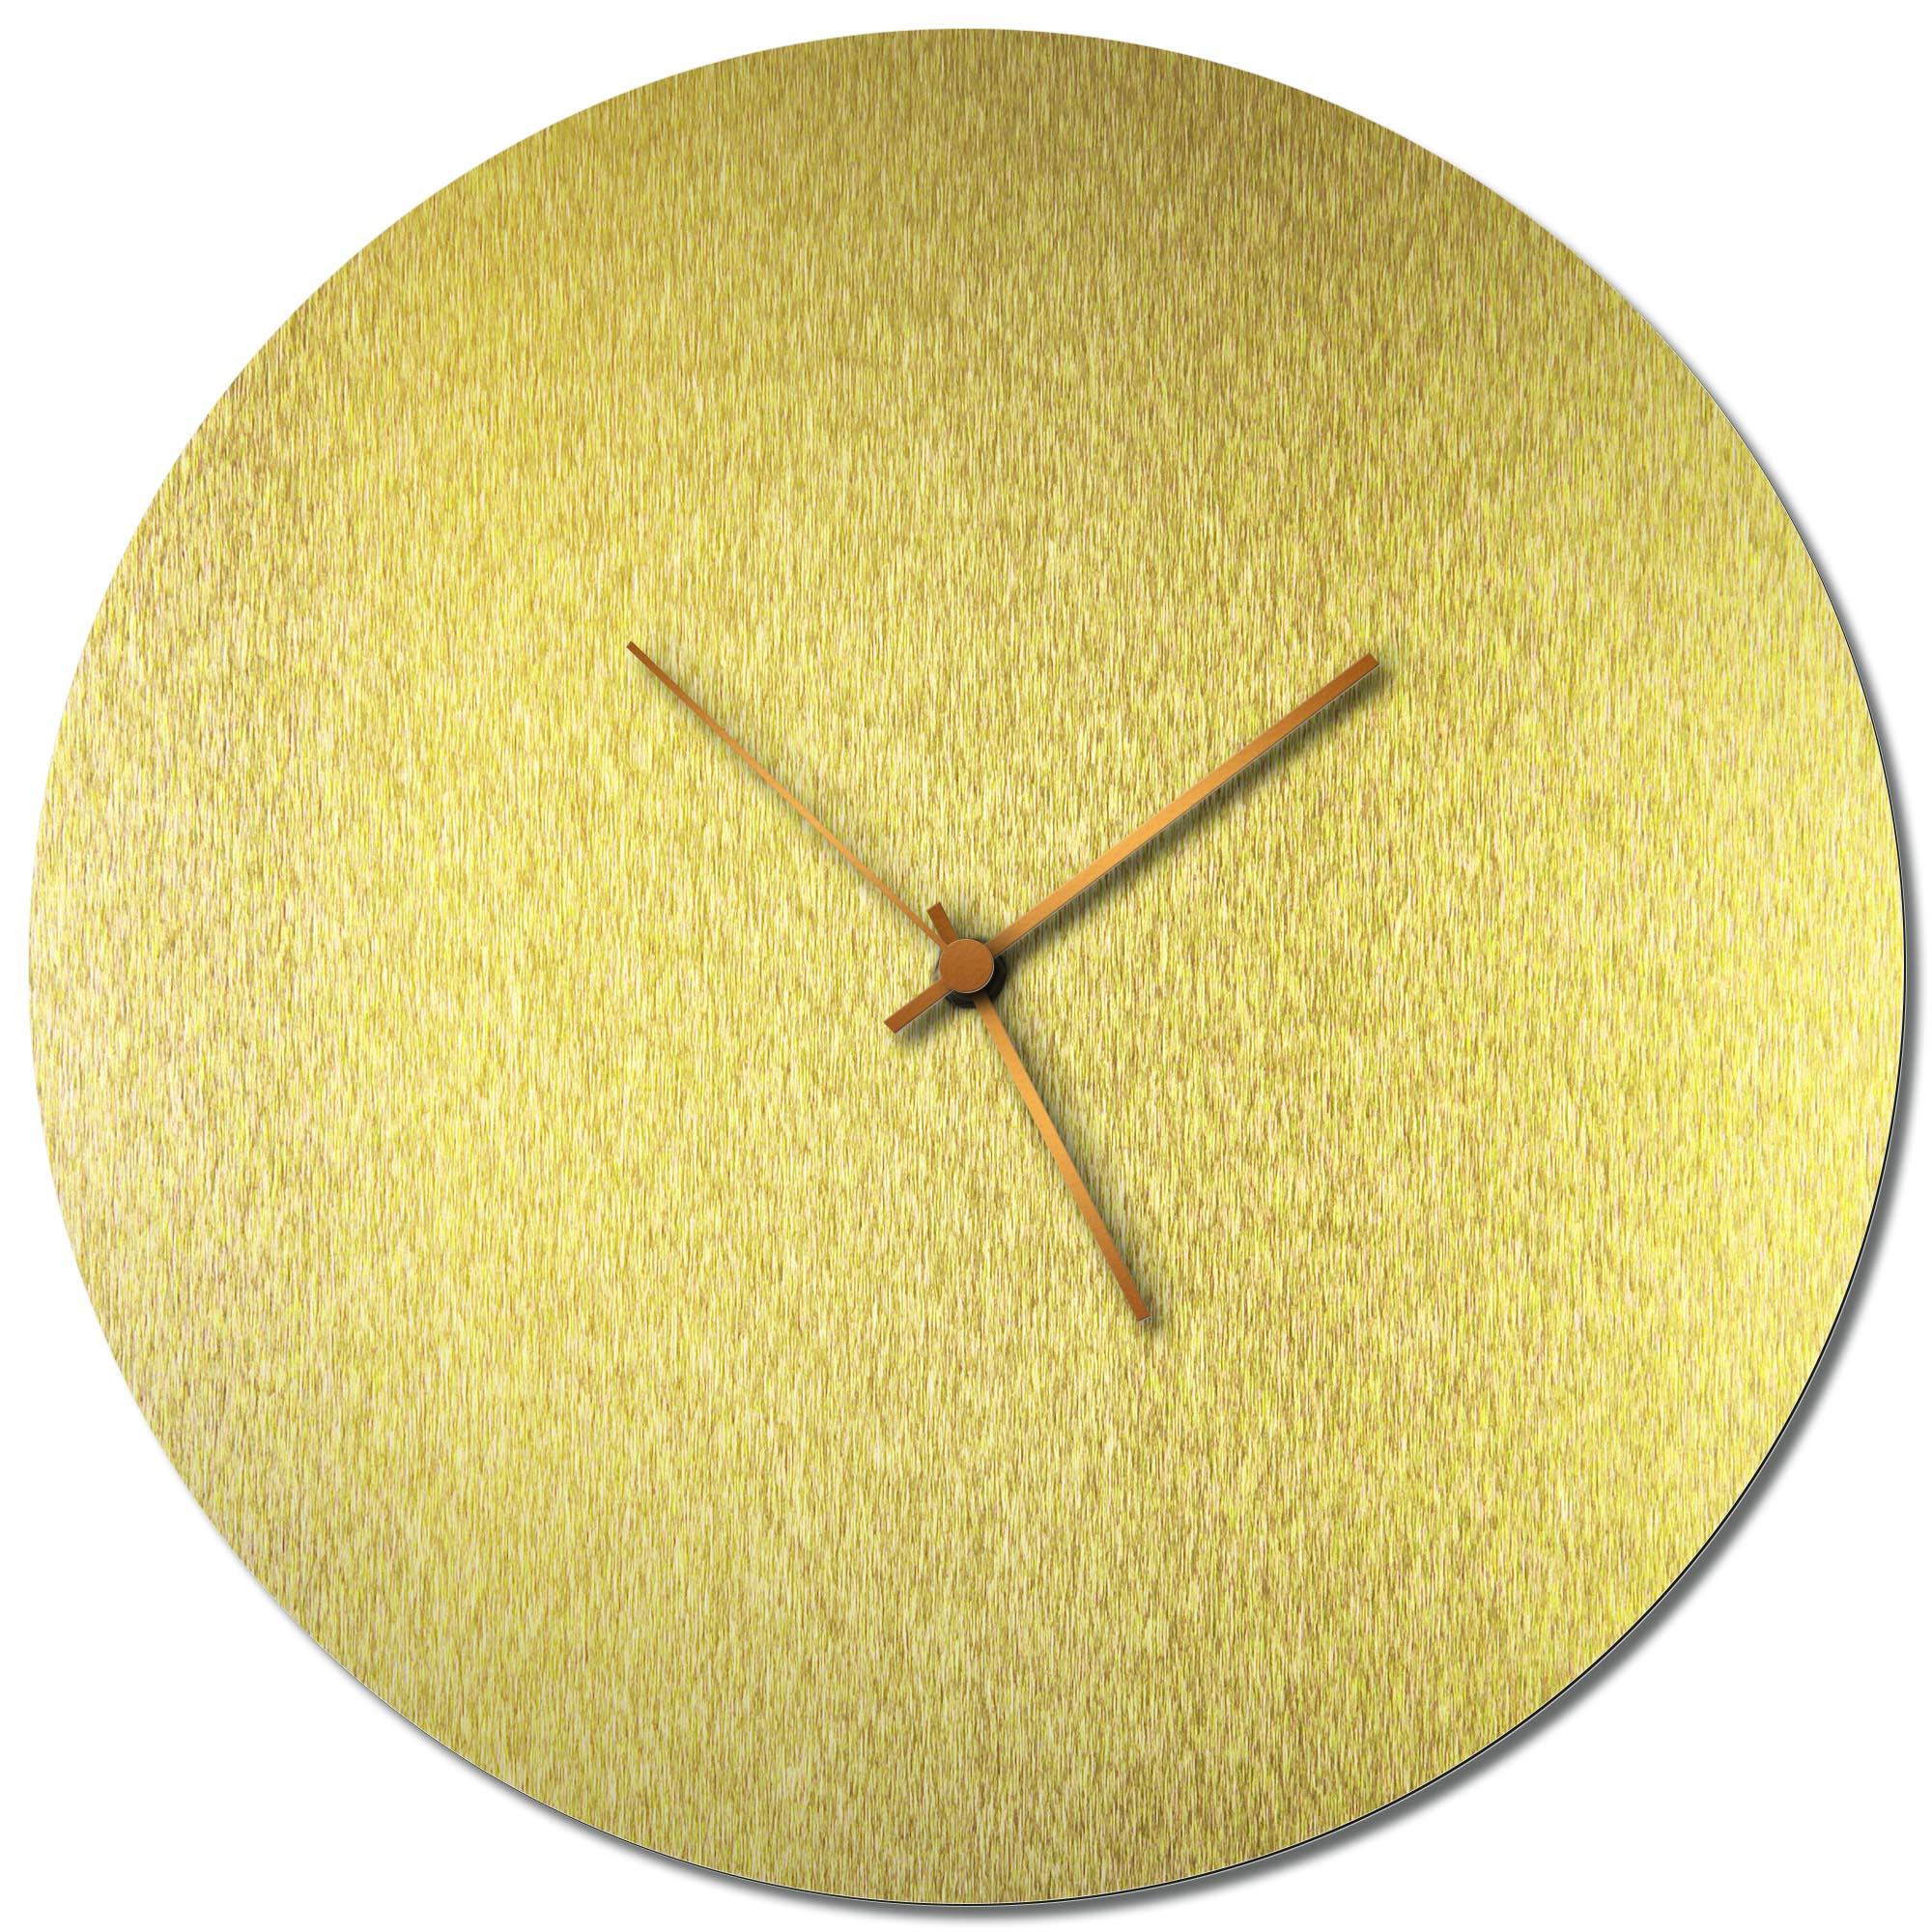 Adam Schwoeppe 'Goldsmith Circle Clock Large Bronze' Midcentury Modern Style Wall Clock